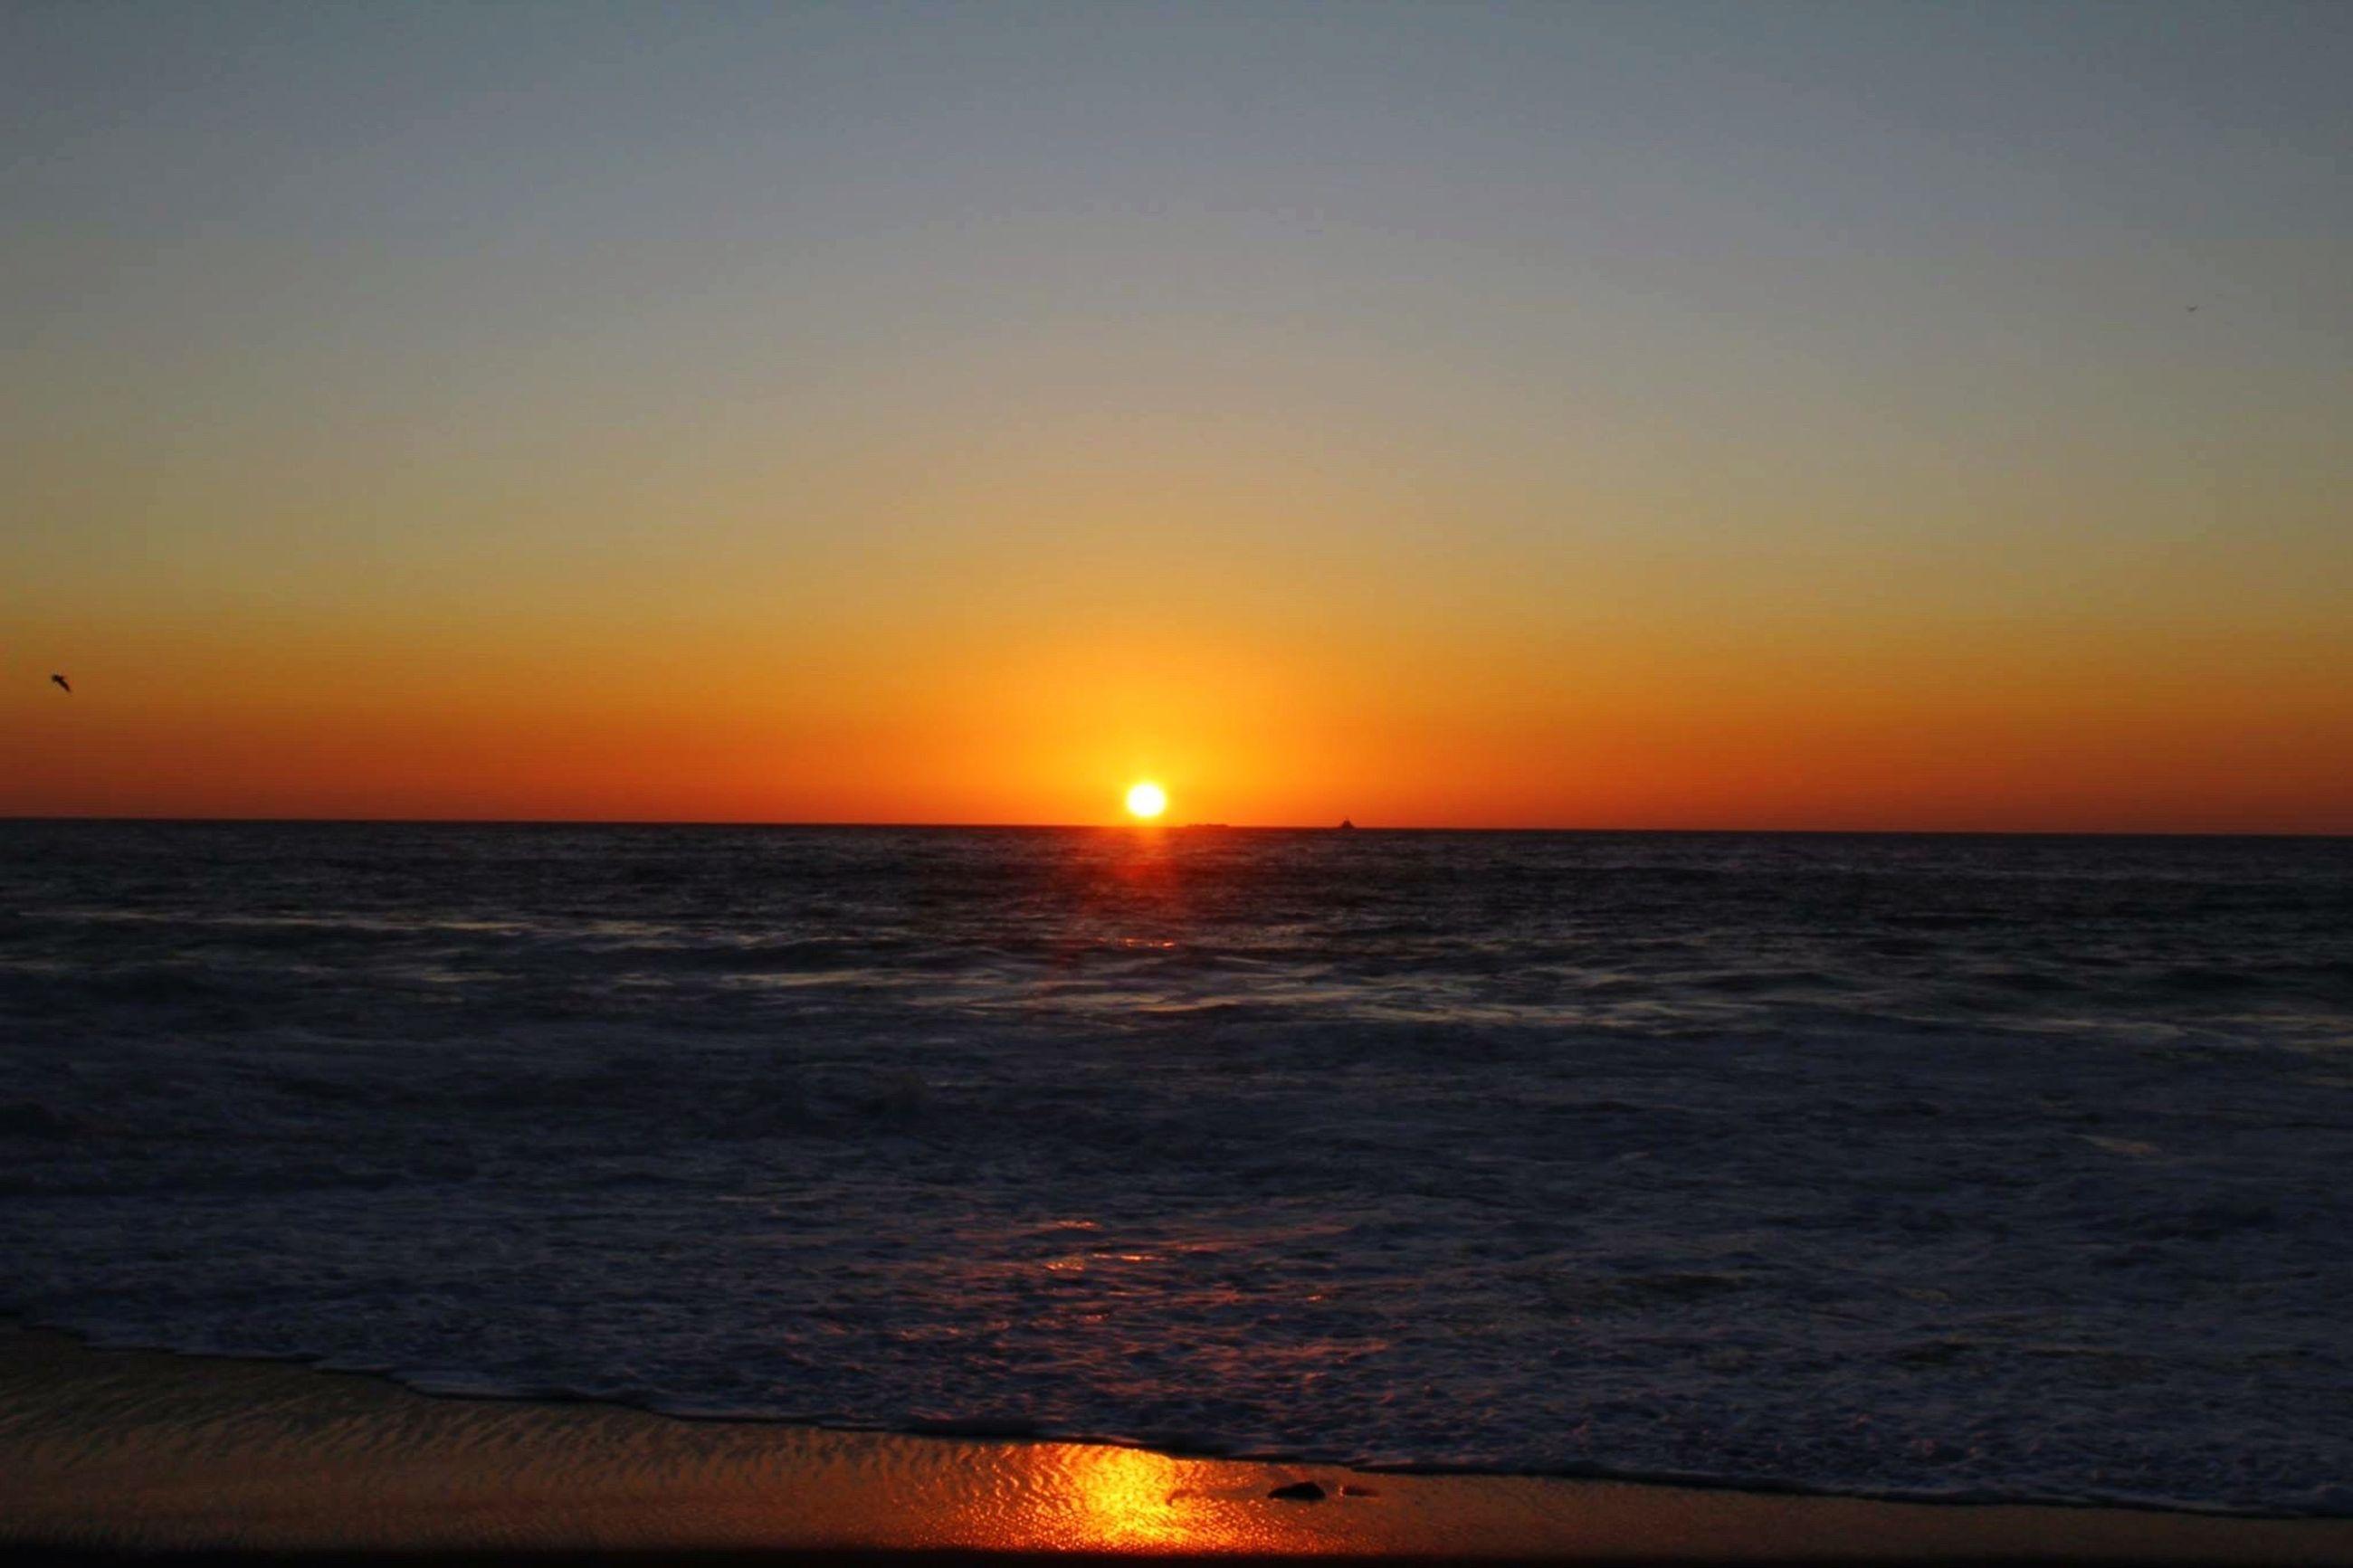 sunset, sea, sun, horizon over water, water, orange color, scenics, tranquil scene, beauty in nature, tranquility, idyllic, nature, sunlight, sky, rippled, seascape, outdoors, remote, no people, ocean, non-urban scene, majestic, sunbeam